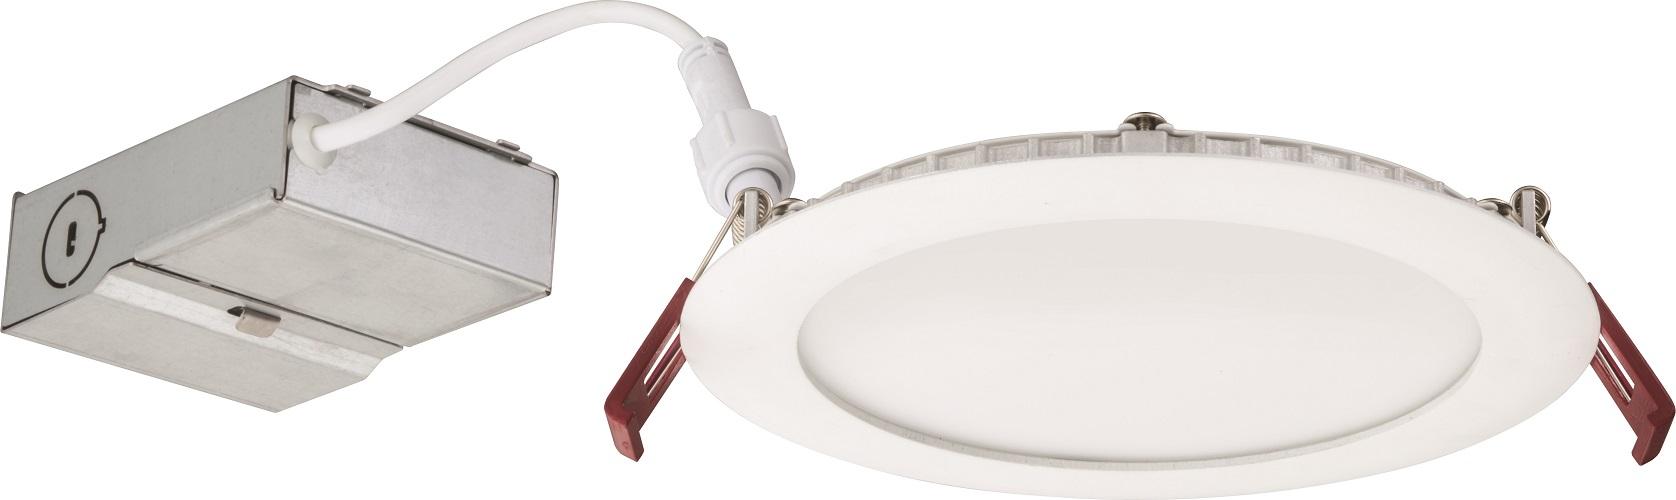 Lithonia Lighting®WF6 LED 30K MW M6